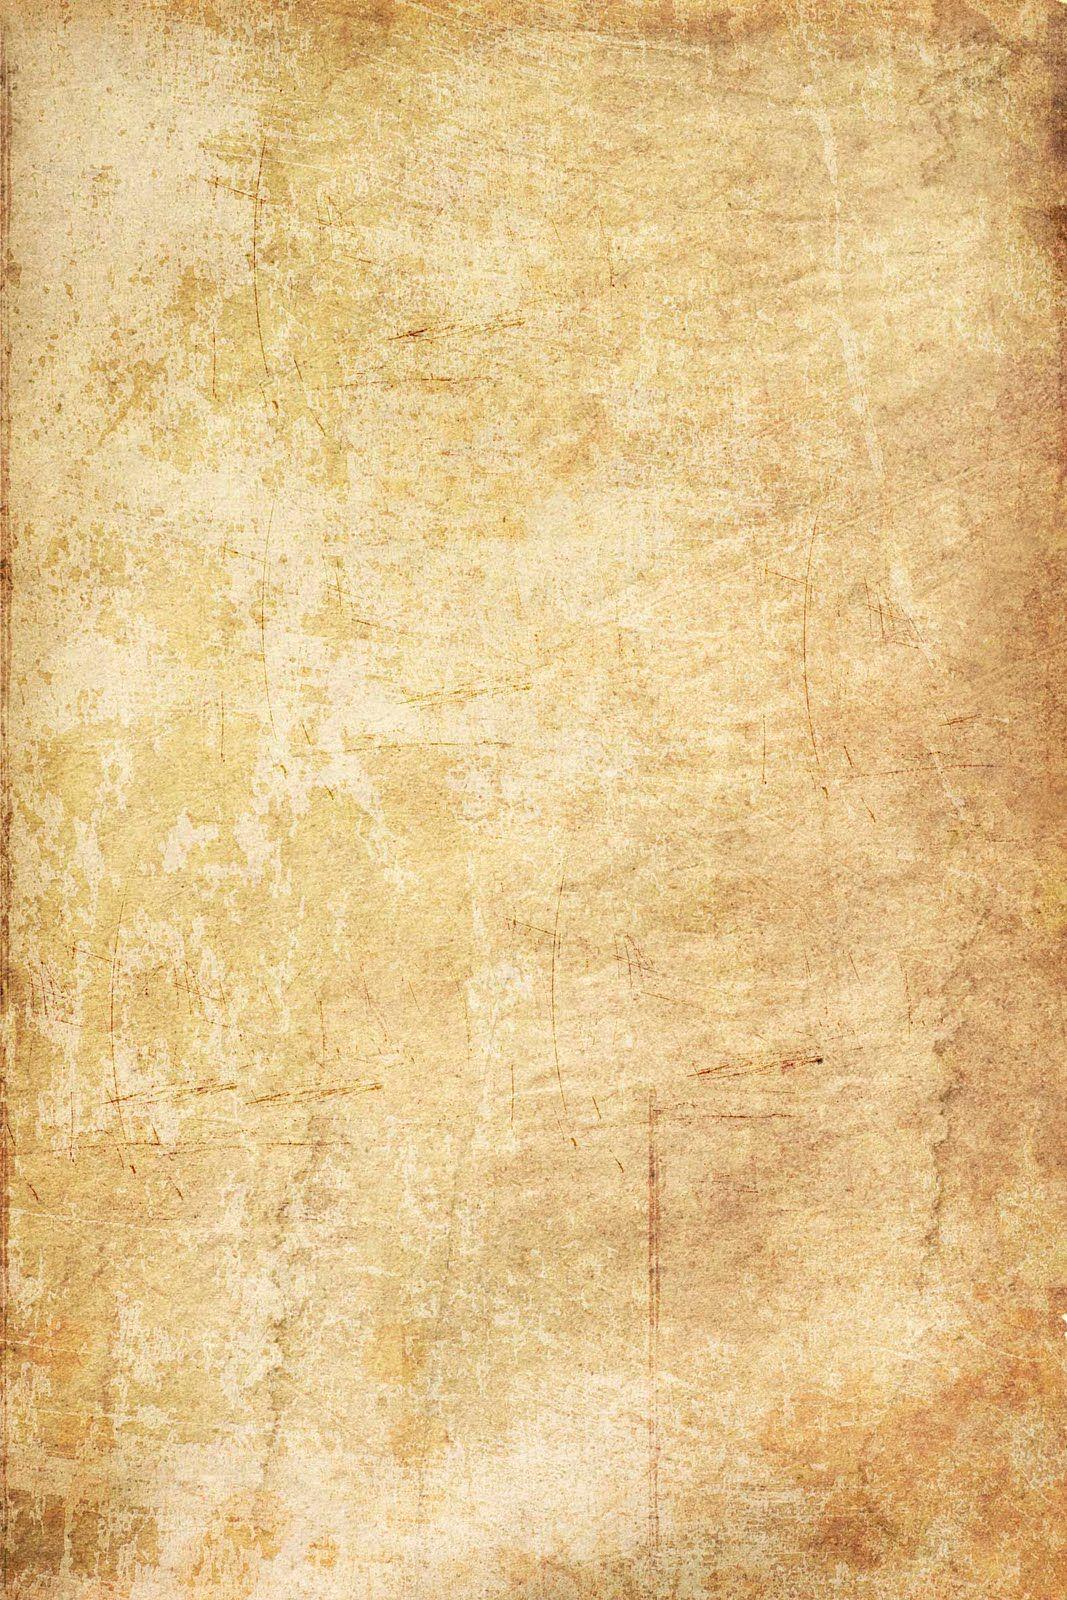 Texture Carta Pergamena Cerca Con Google 19 91 Carta